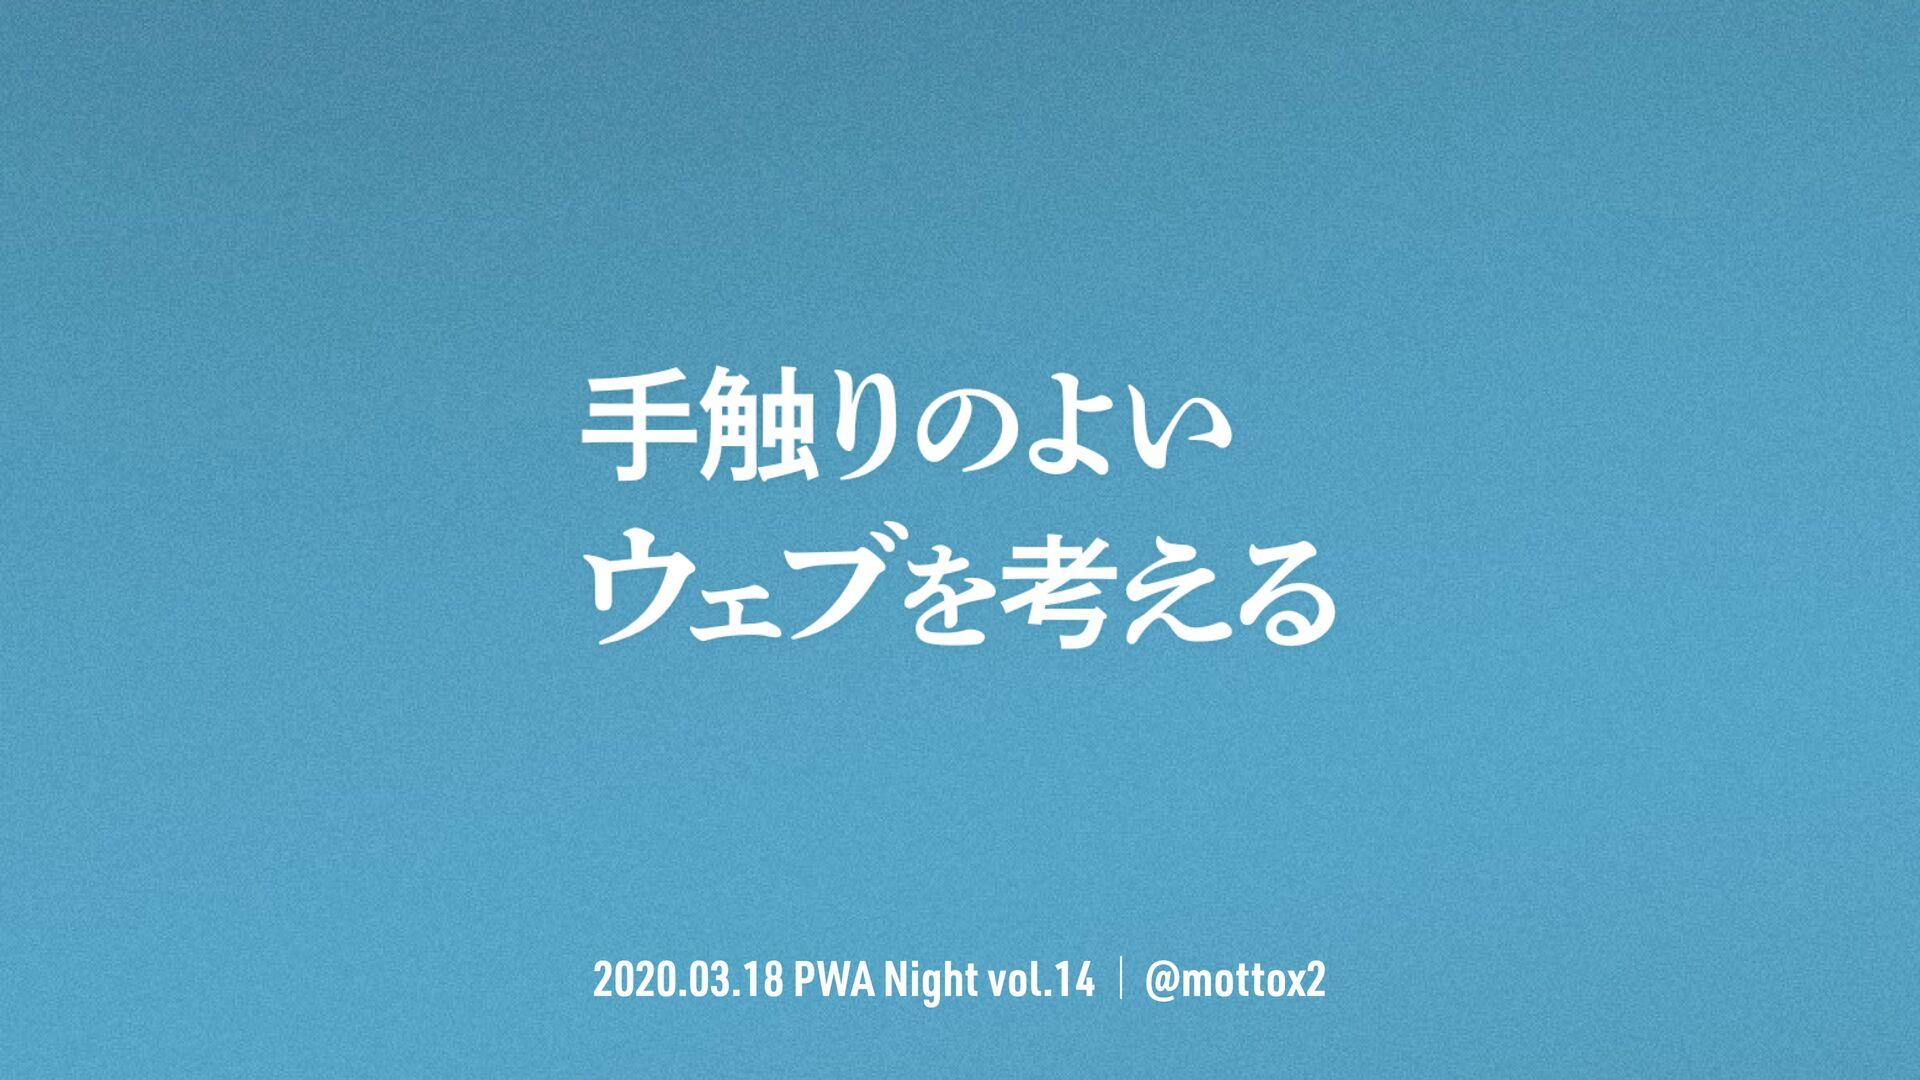 2020.03.18 PWA Night vol.14 / @mottox2 ⼿触りのよい ウ...